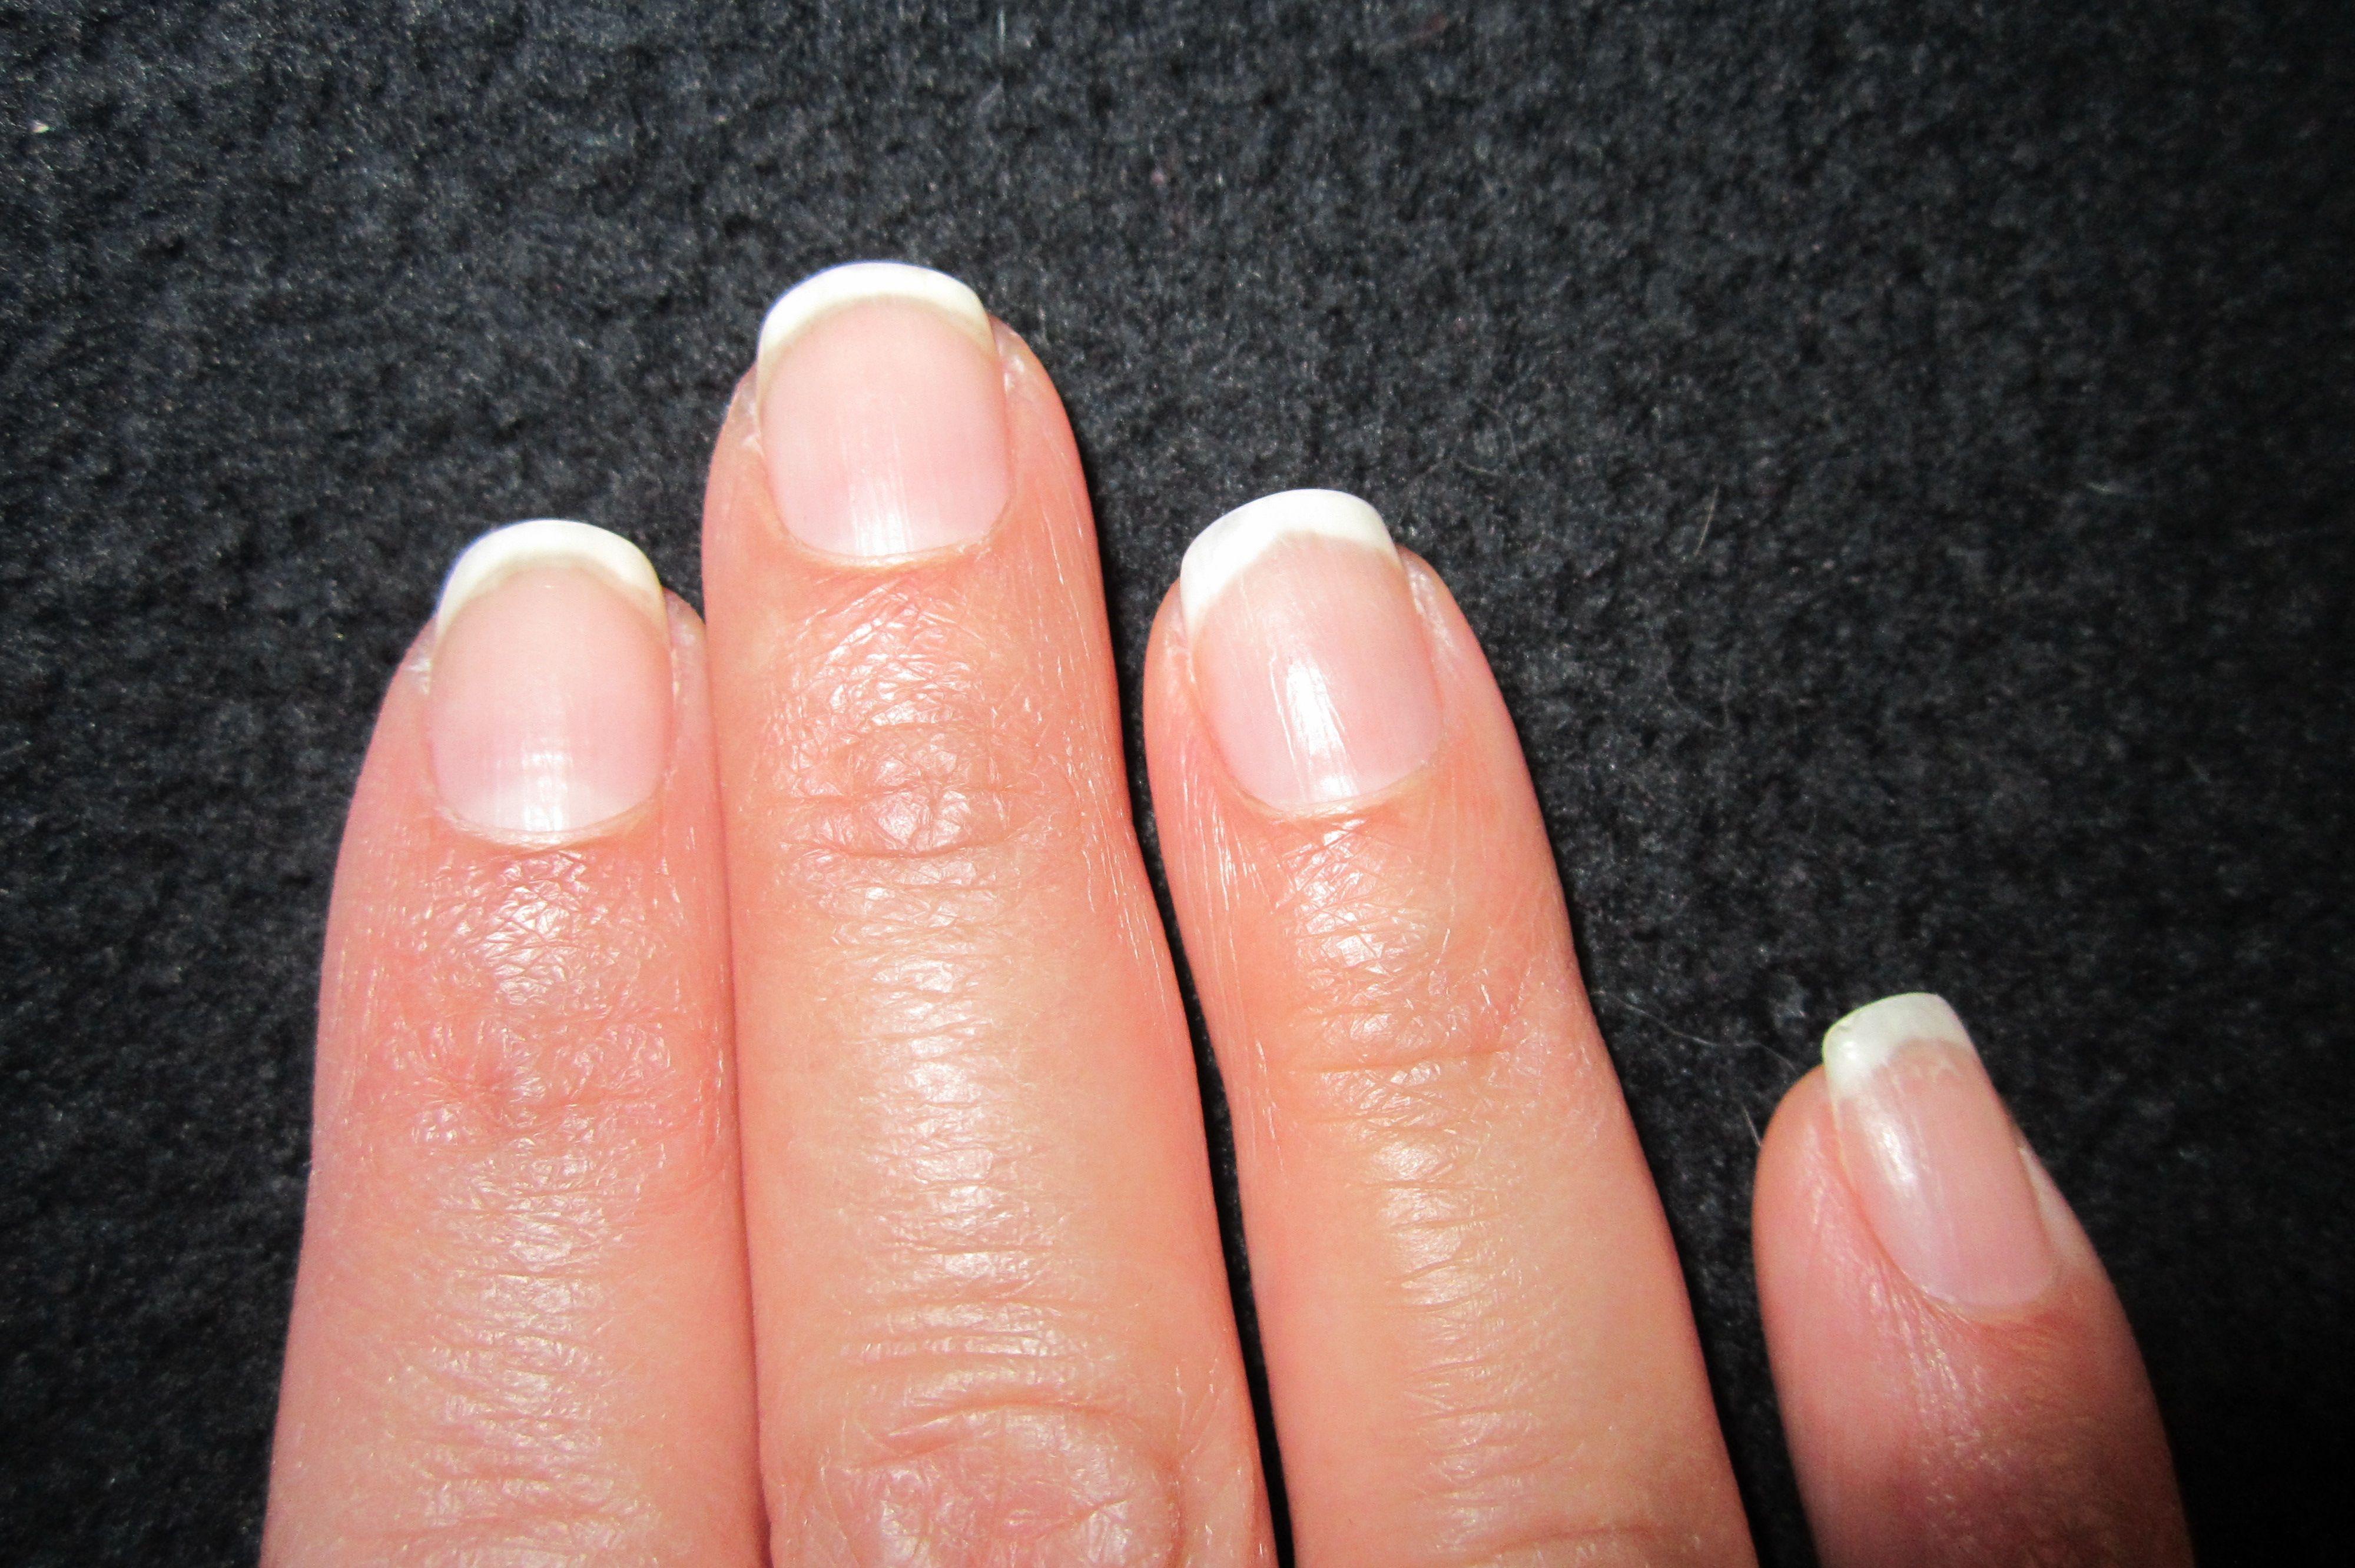 Diy nail strengthener and growth potion nail growth